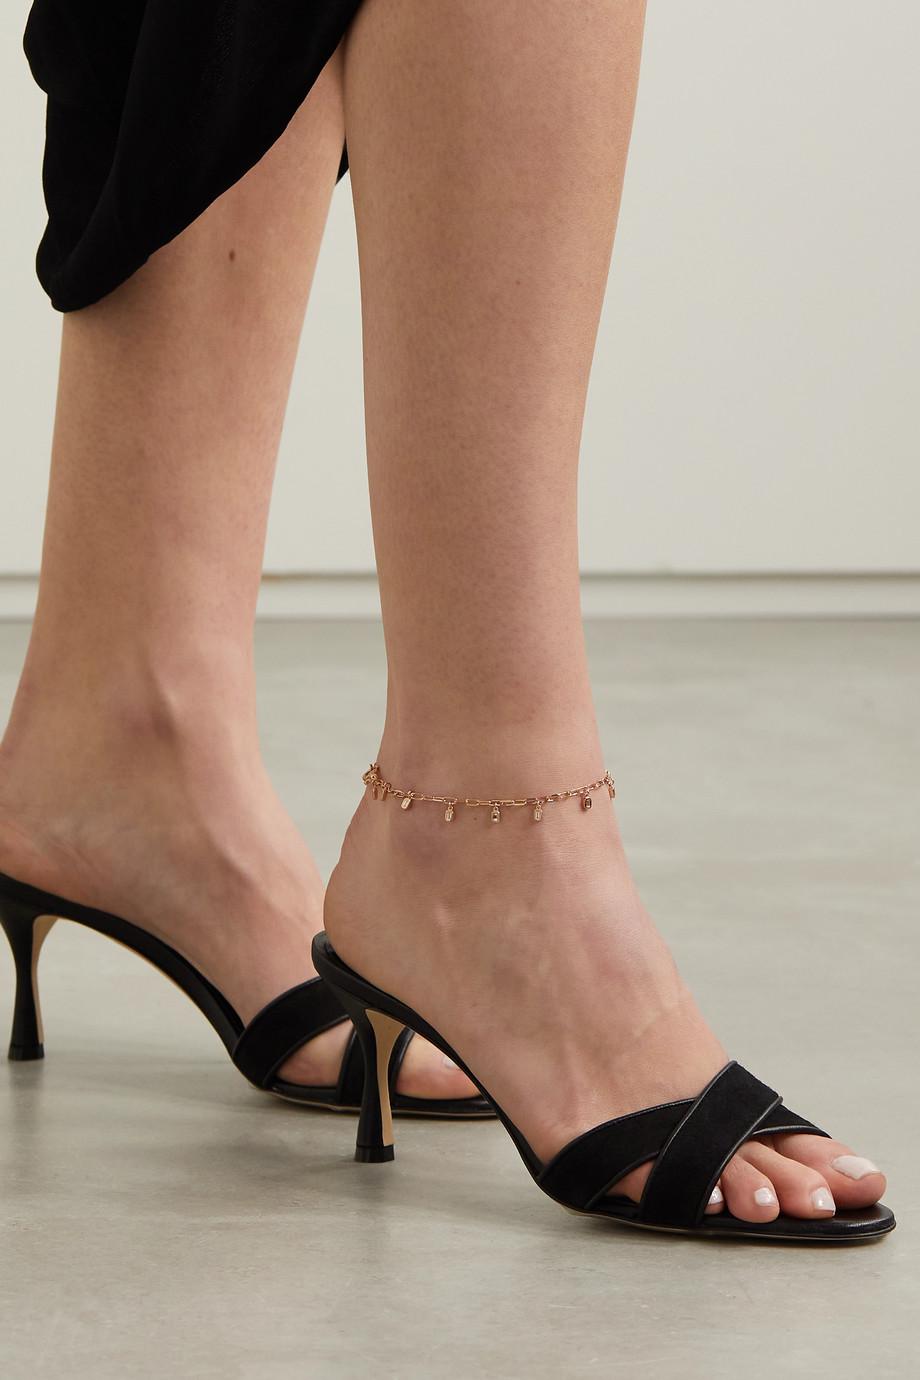 SHAY 18-karat rose gold diamond anklet